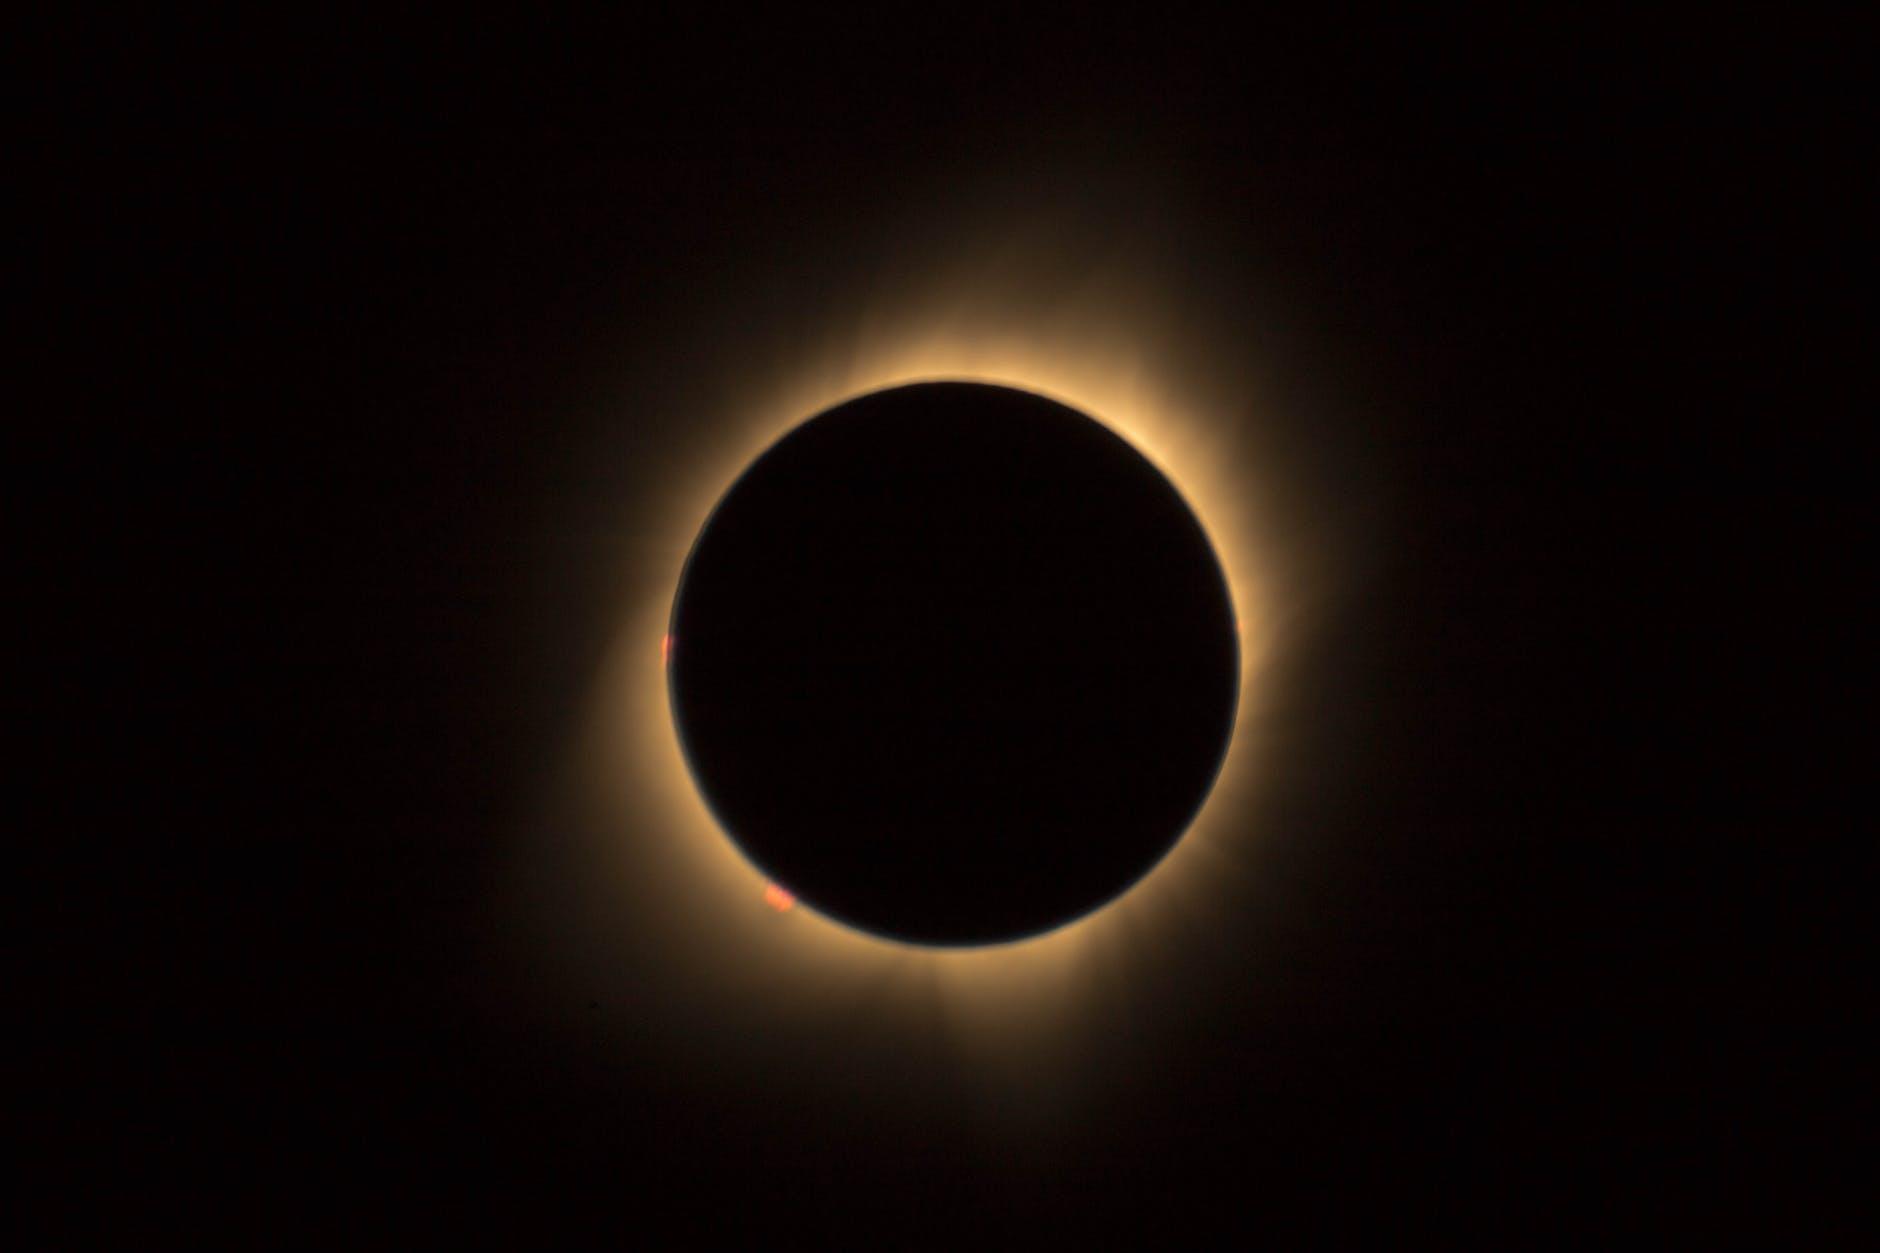 eclipse digital wallpaper